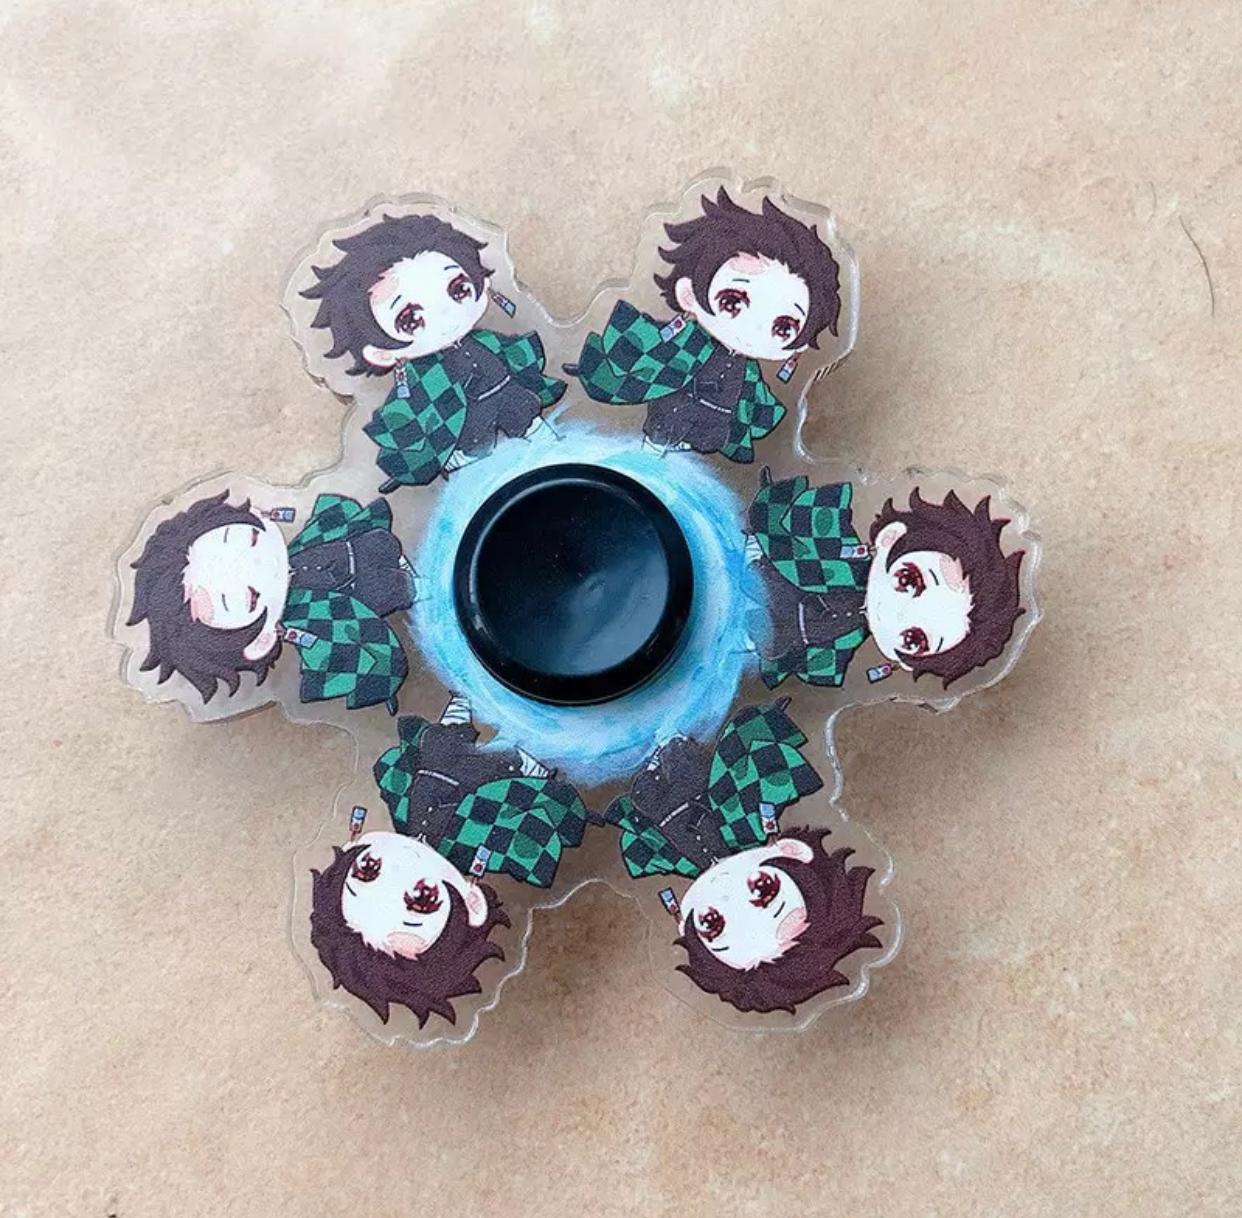 Hand Spinner Motion Tanjiro Kamado: Demon Slayer  Kimetsu no Yaiba - Rolamento Anti Estresse Fidget Hand Spinner - EVALI